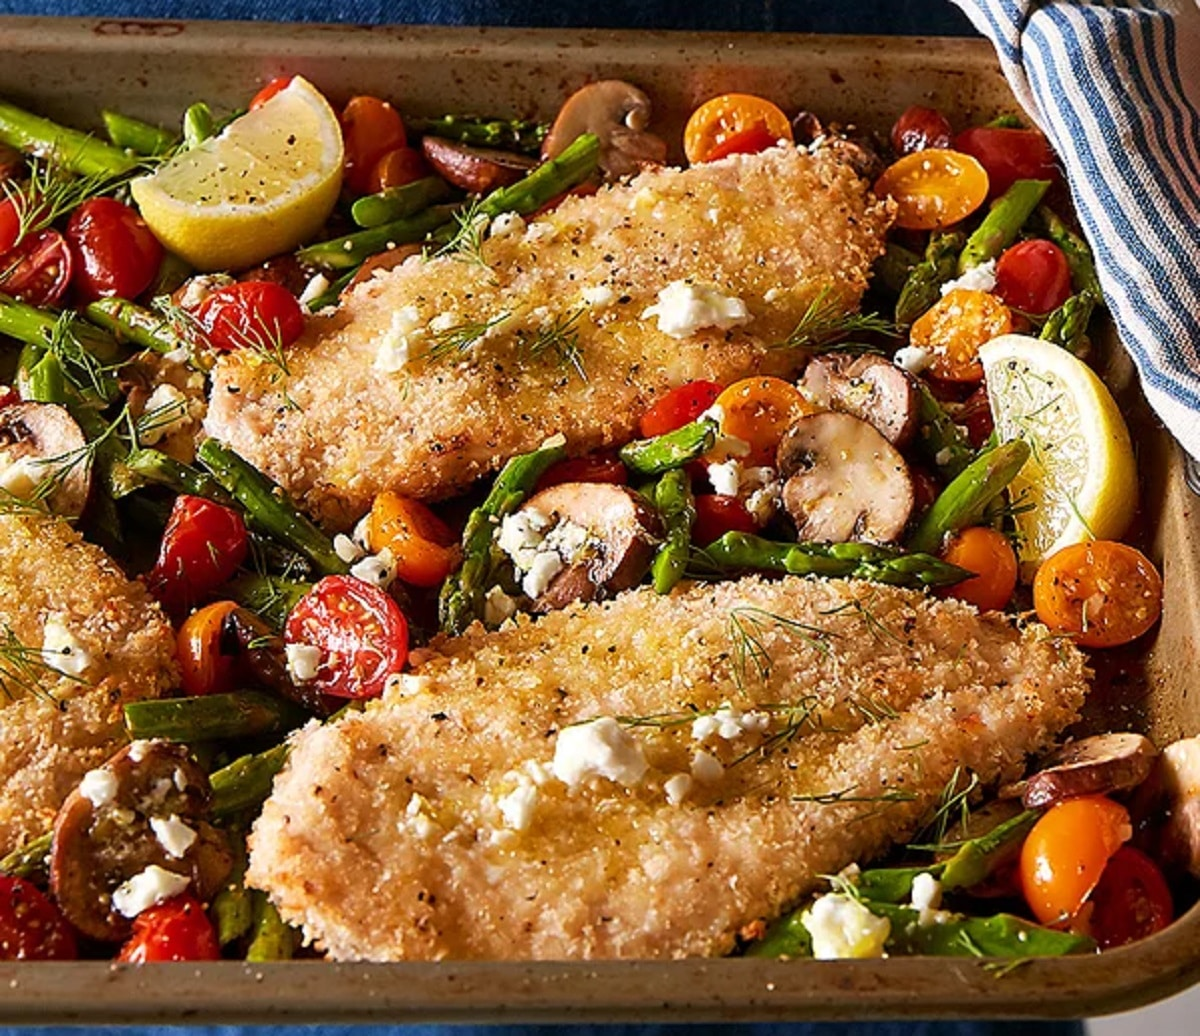 Greek chicken with roasted spring vegetables and lemon vinaigrette